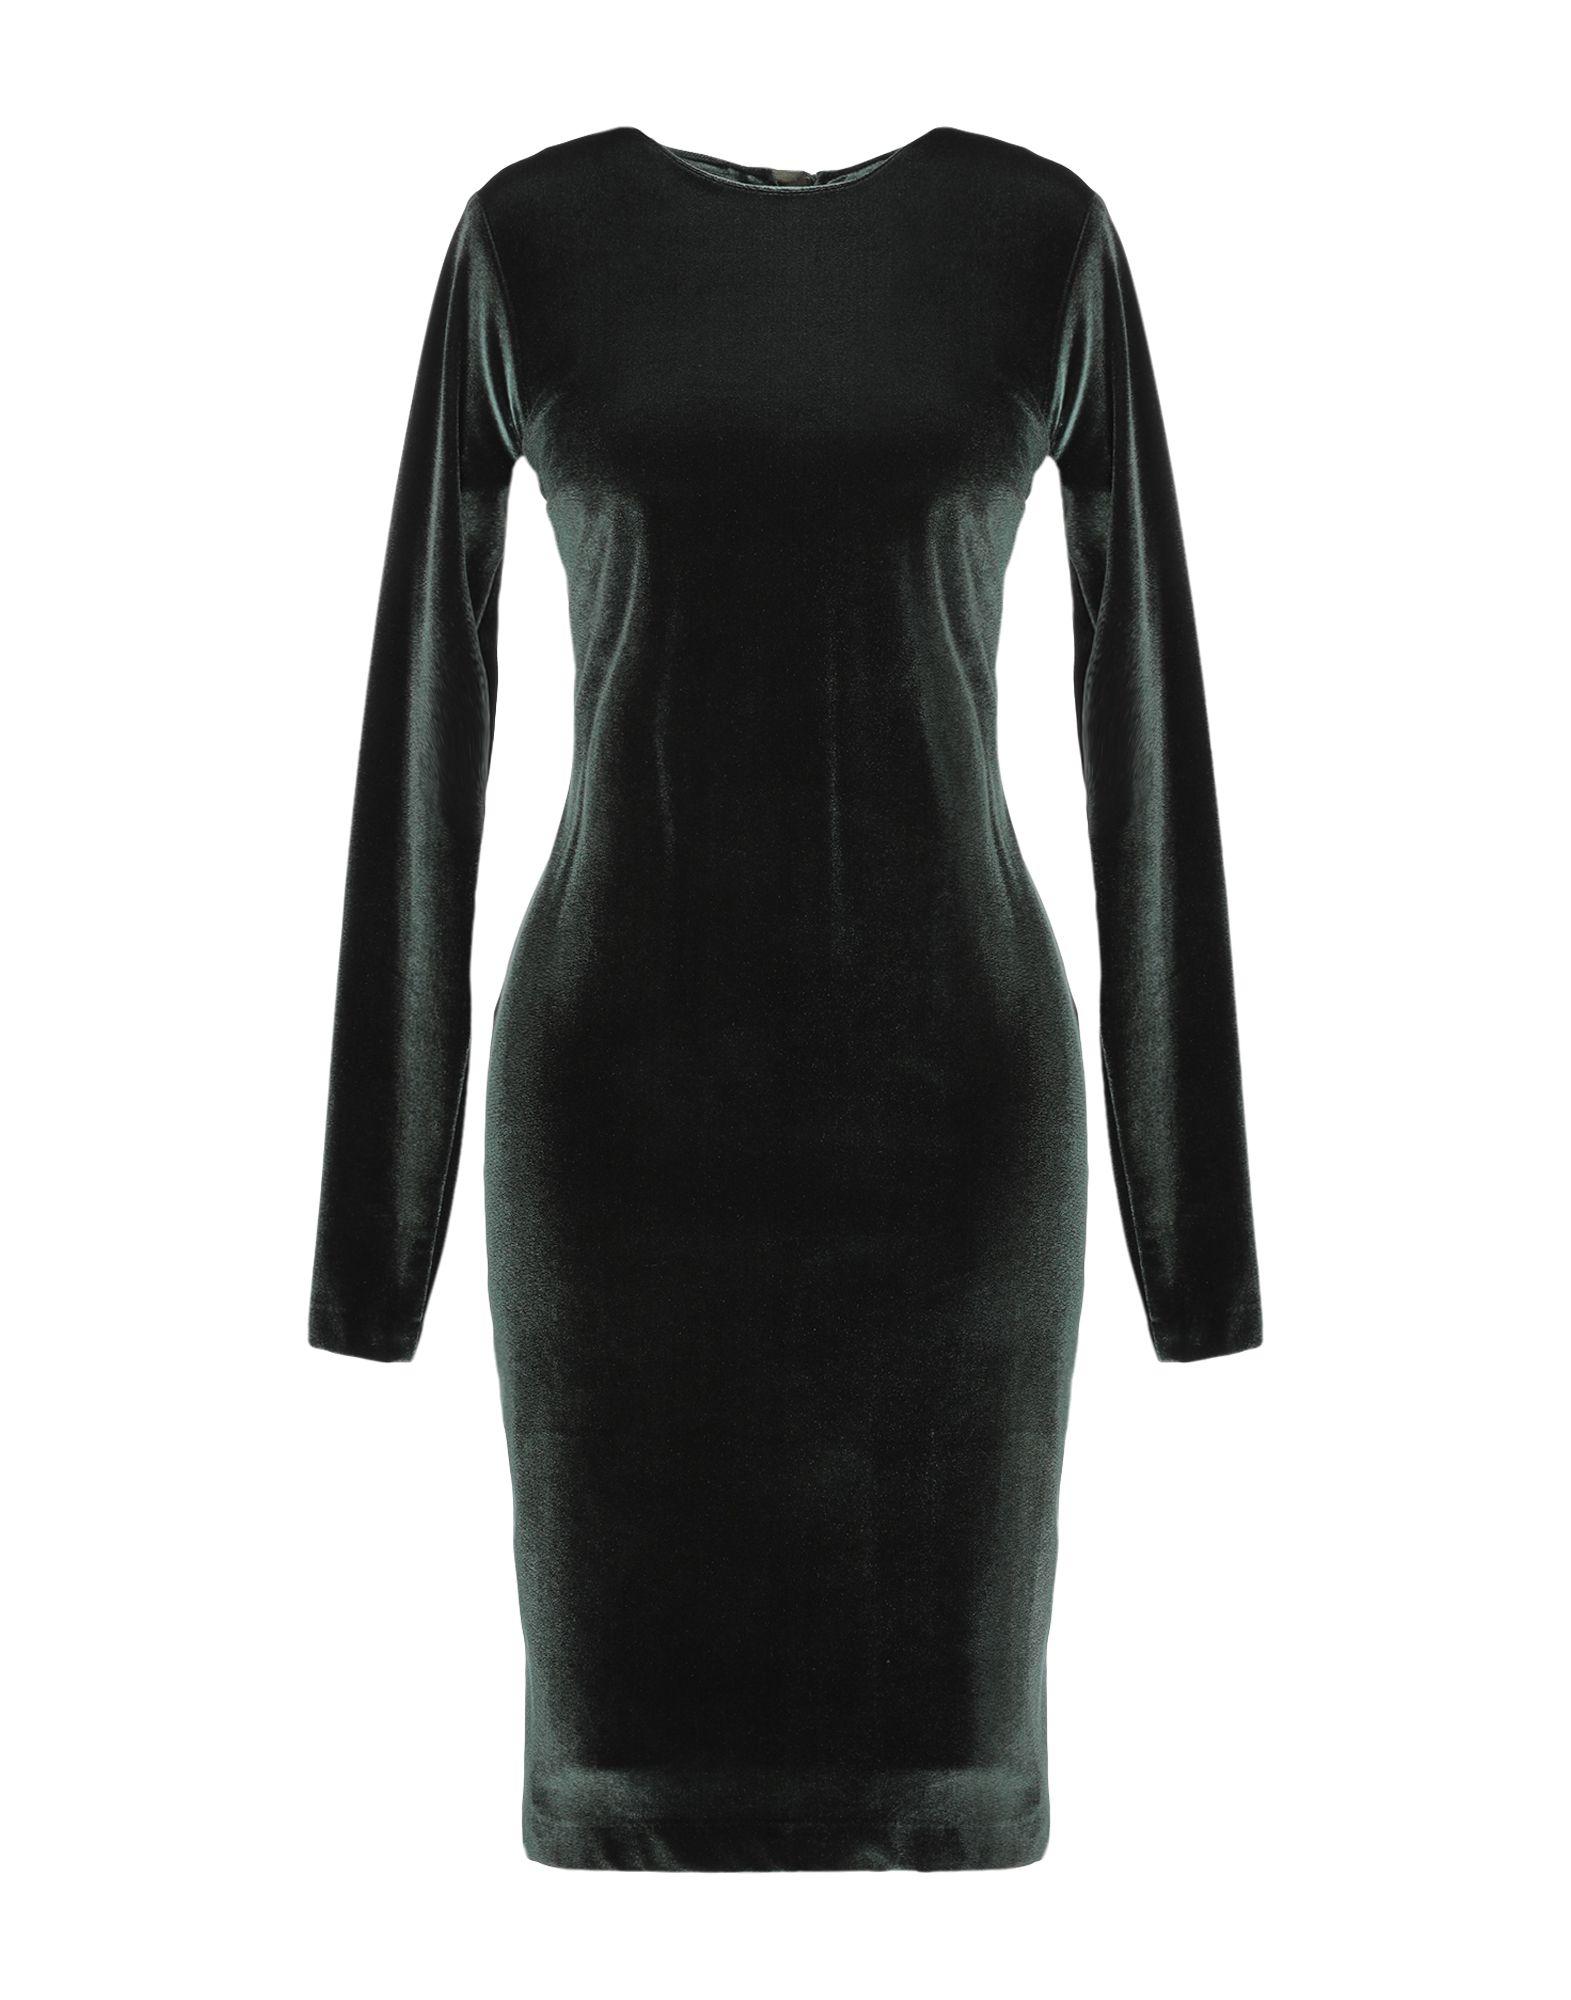 ALTEЯƎGO Платье до колена